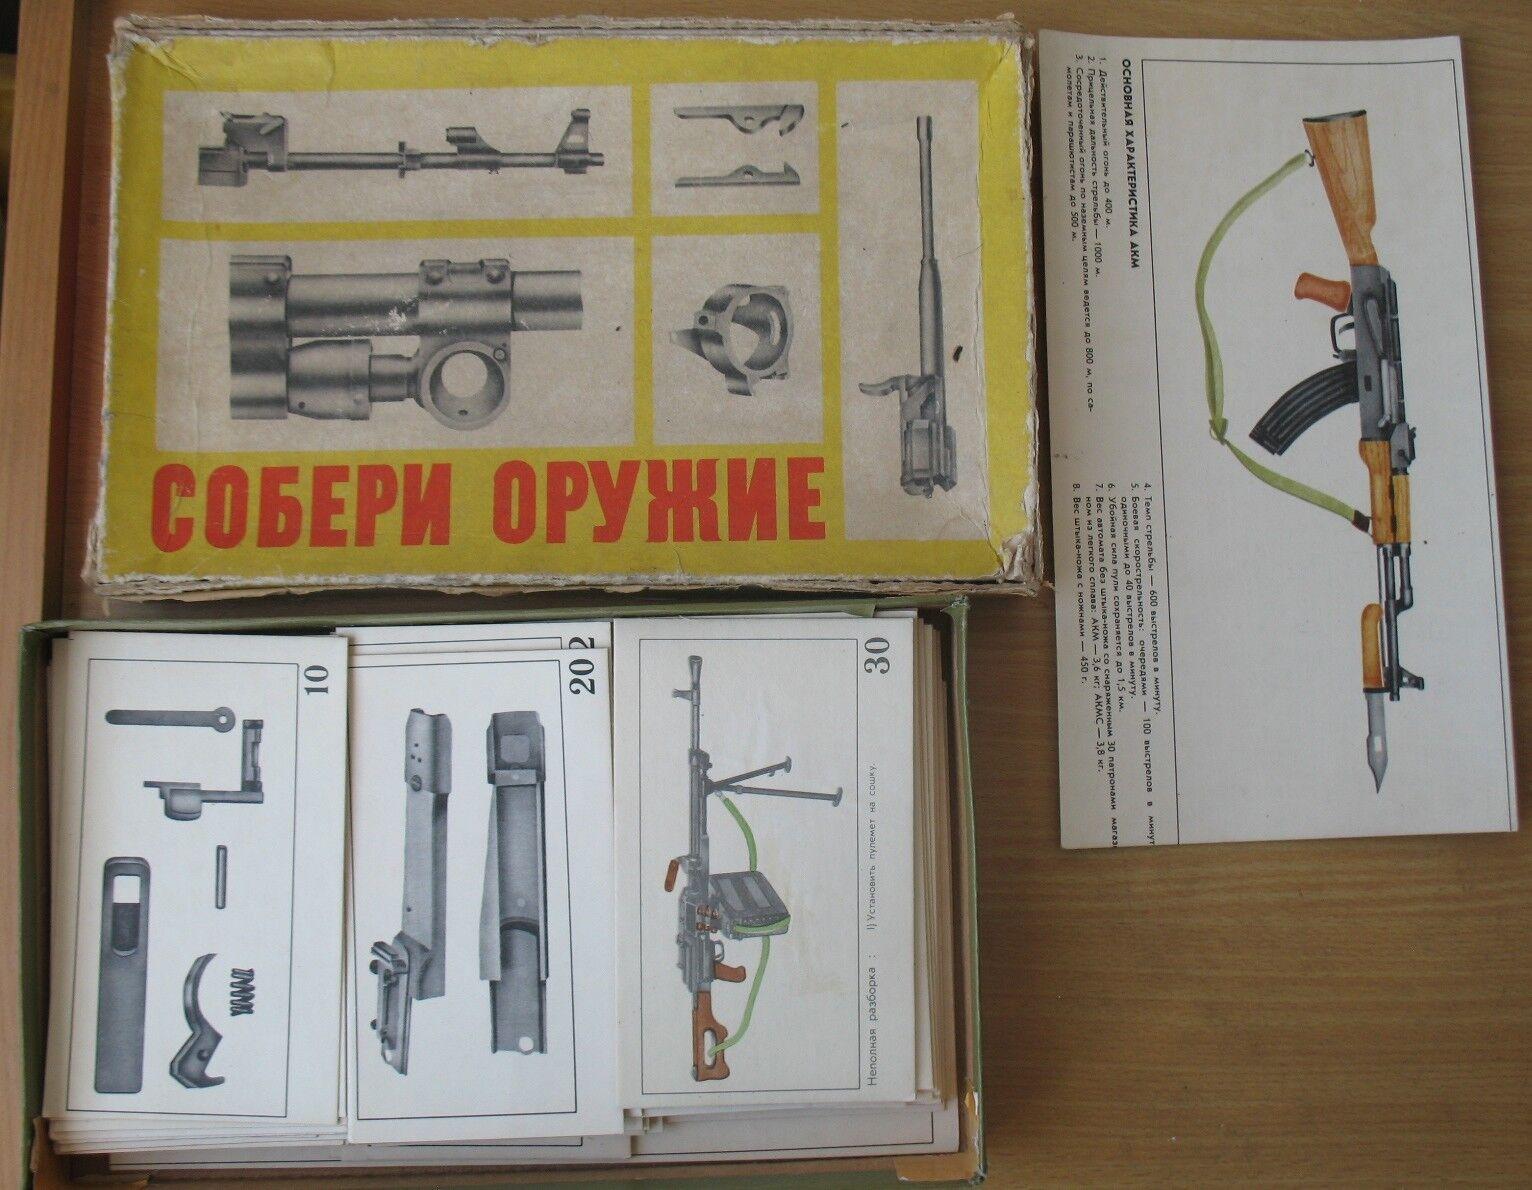 Russe Tableau Board Game recueillir arme armée fusil mitrailleuse AKM PK TOZ SPR Ki